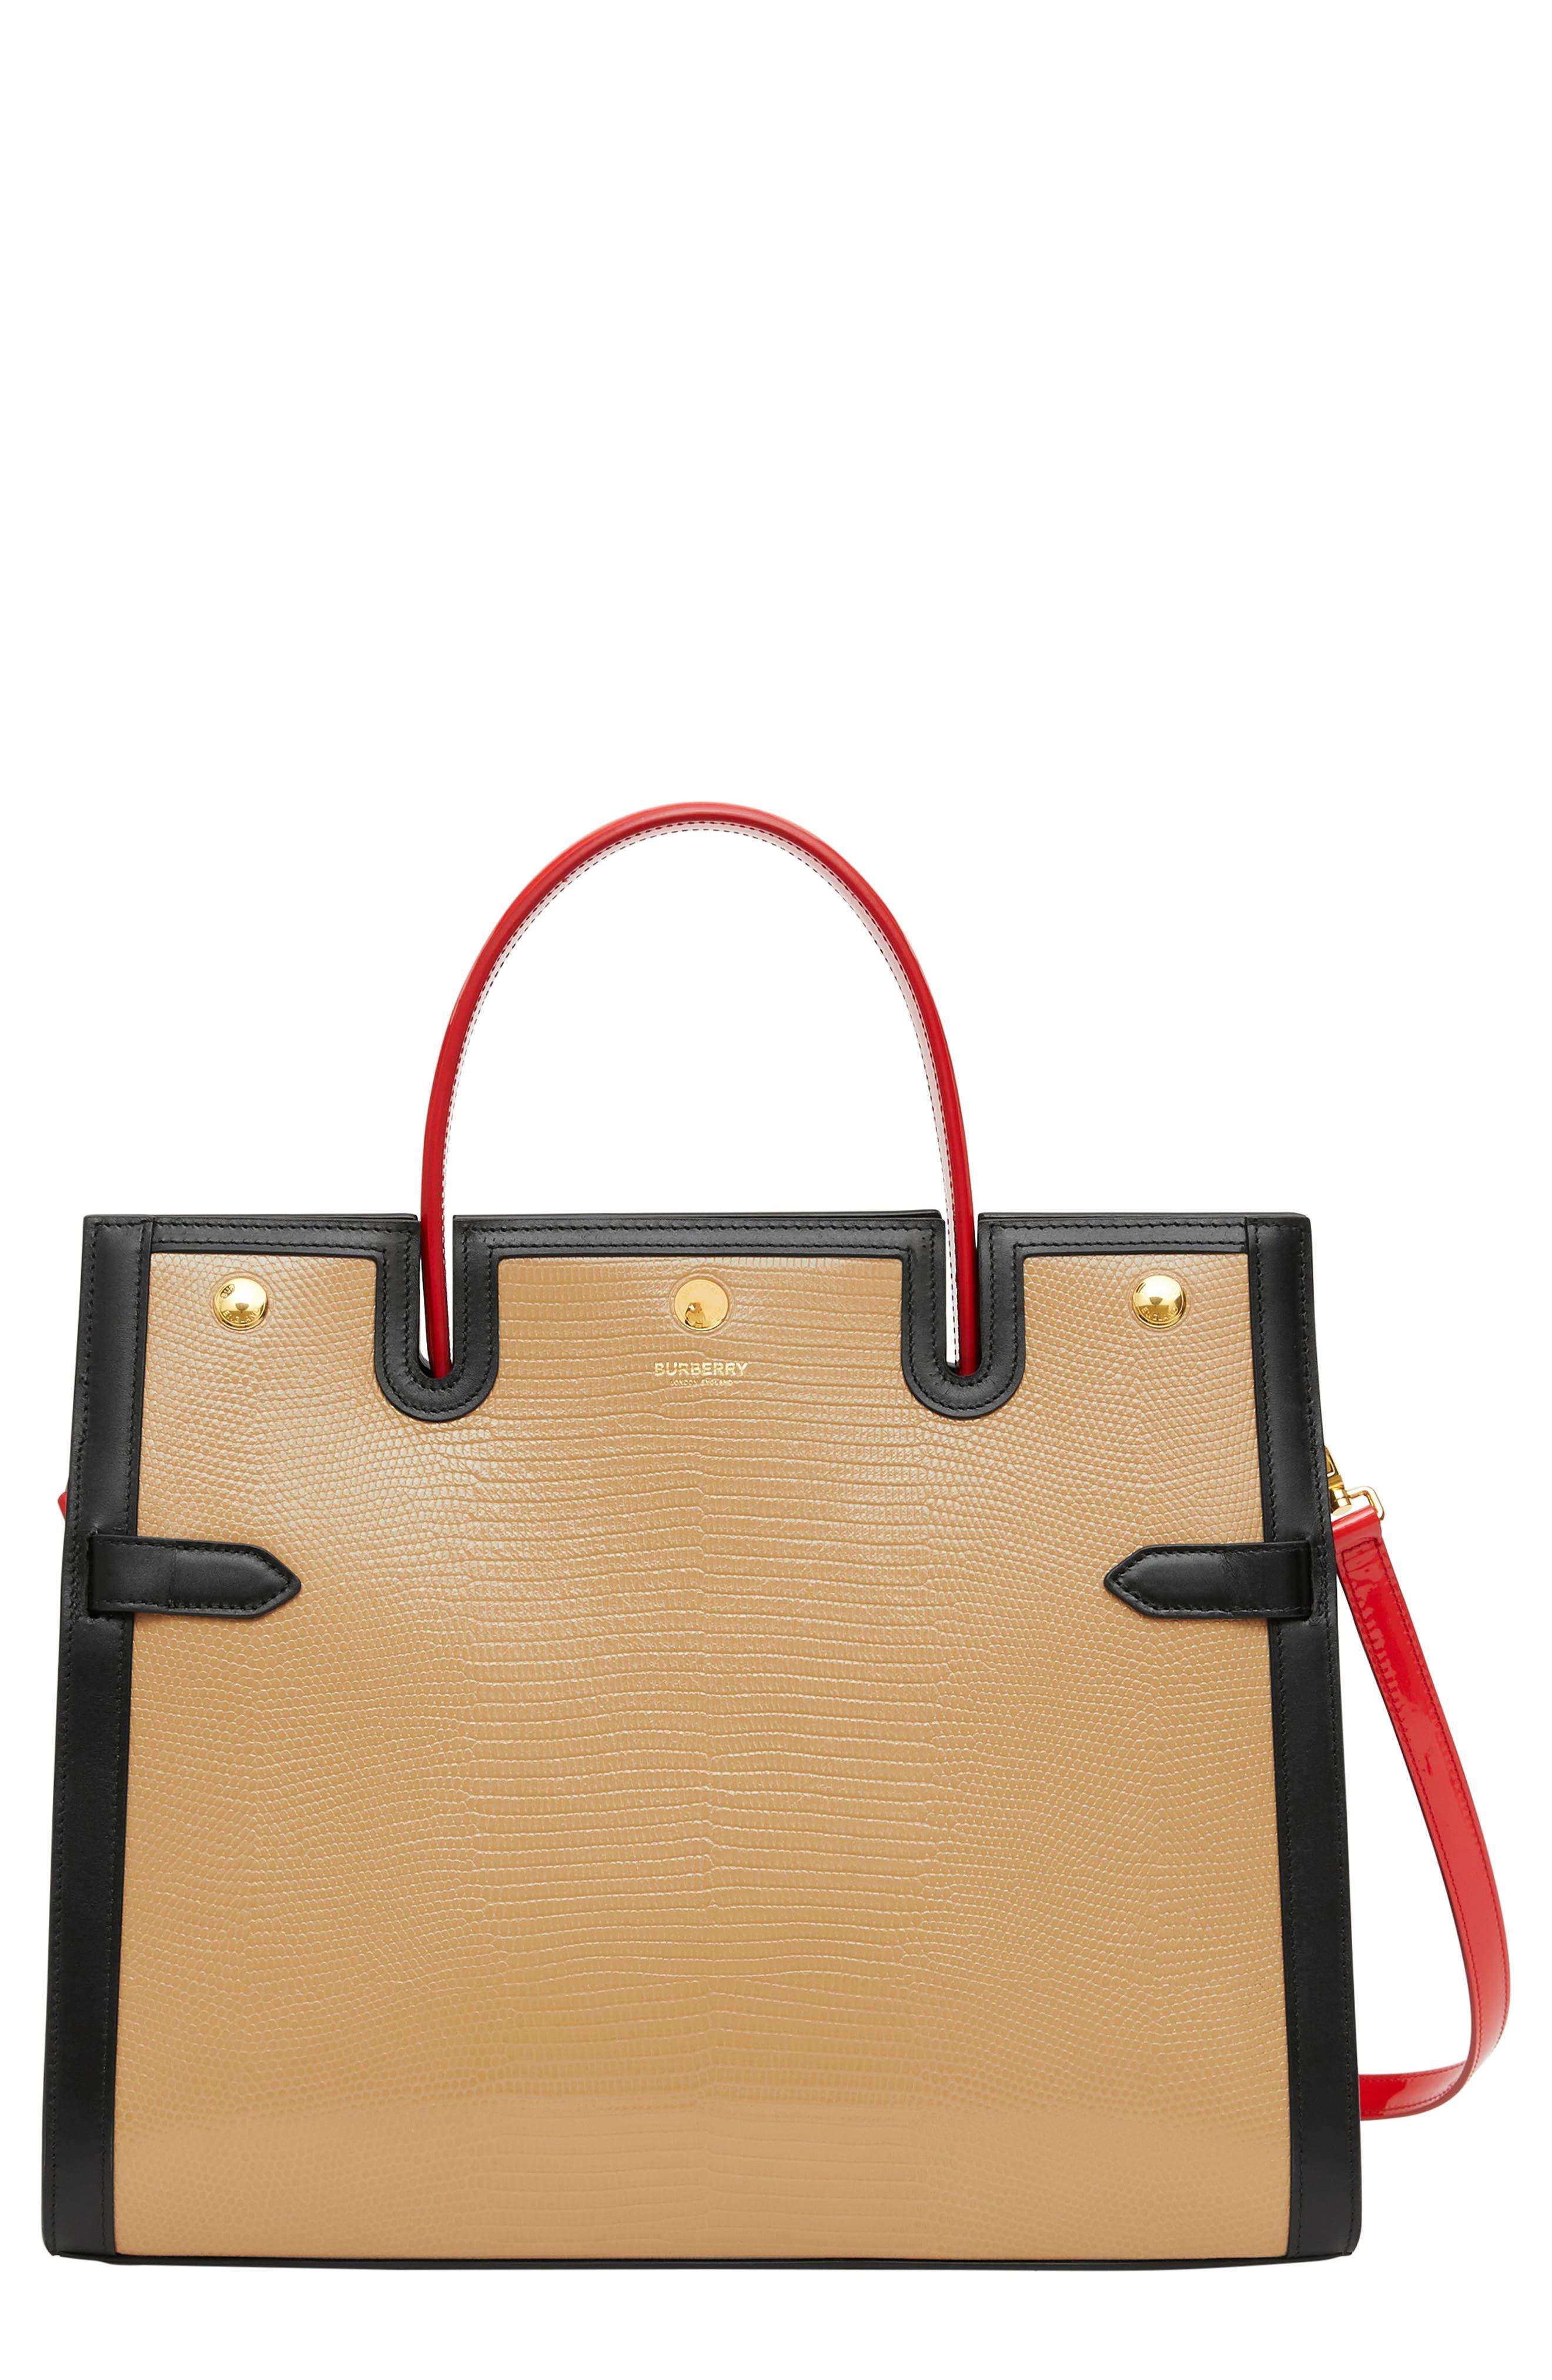 Burberry Bags Medium Title Lizard Embossed Leather Bag